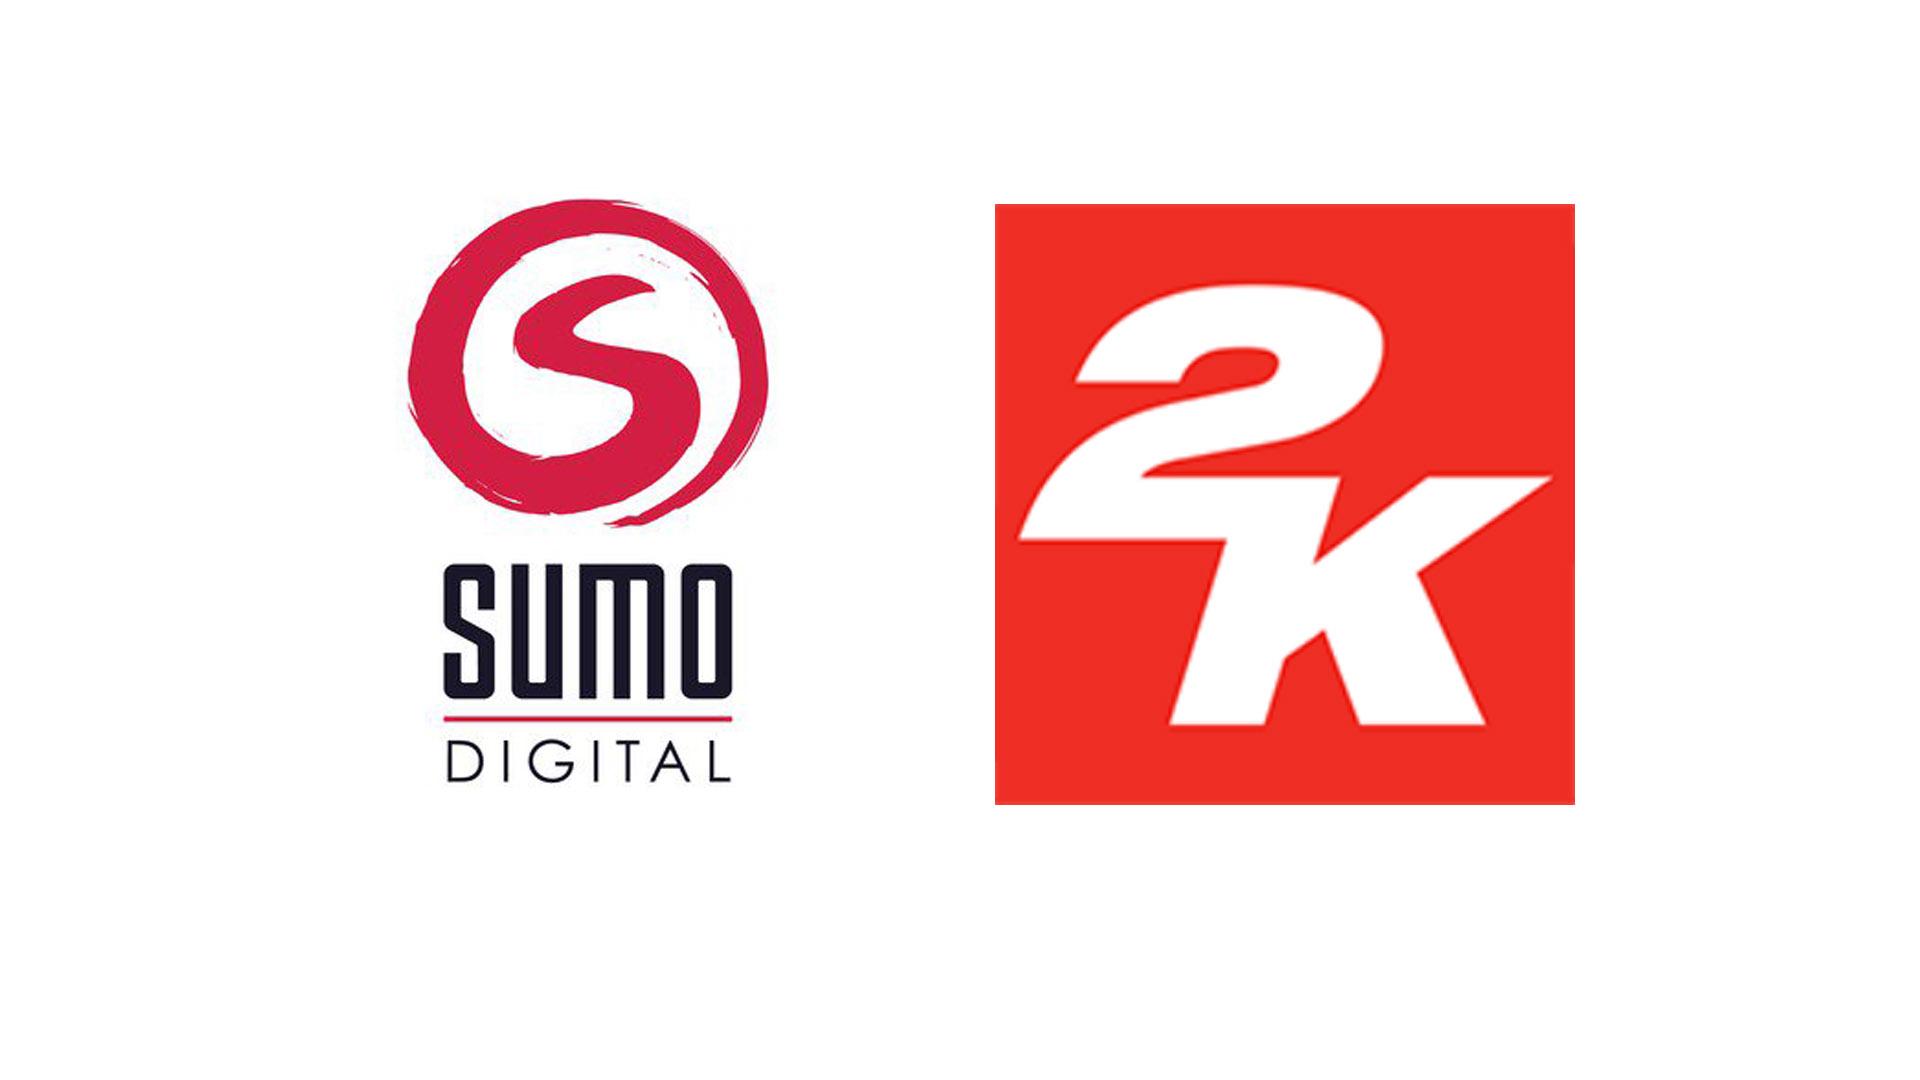 sumo digital 2k games